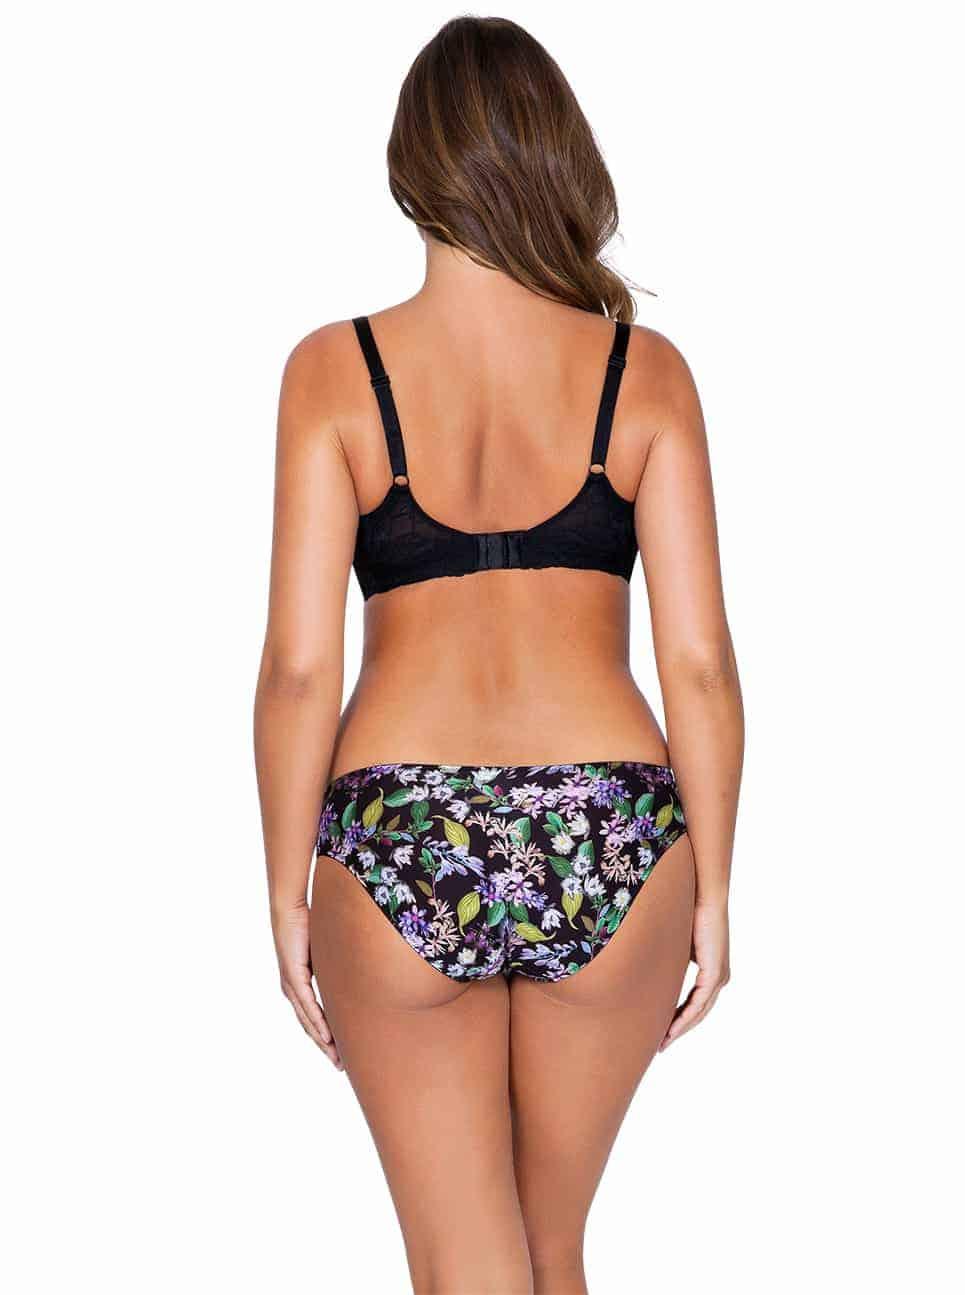 Ava P5371 PaddedBra P5373 BikiniBack 1 - Ava Bikini - Black Floral - P5373